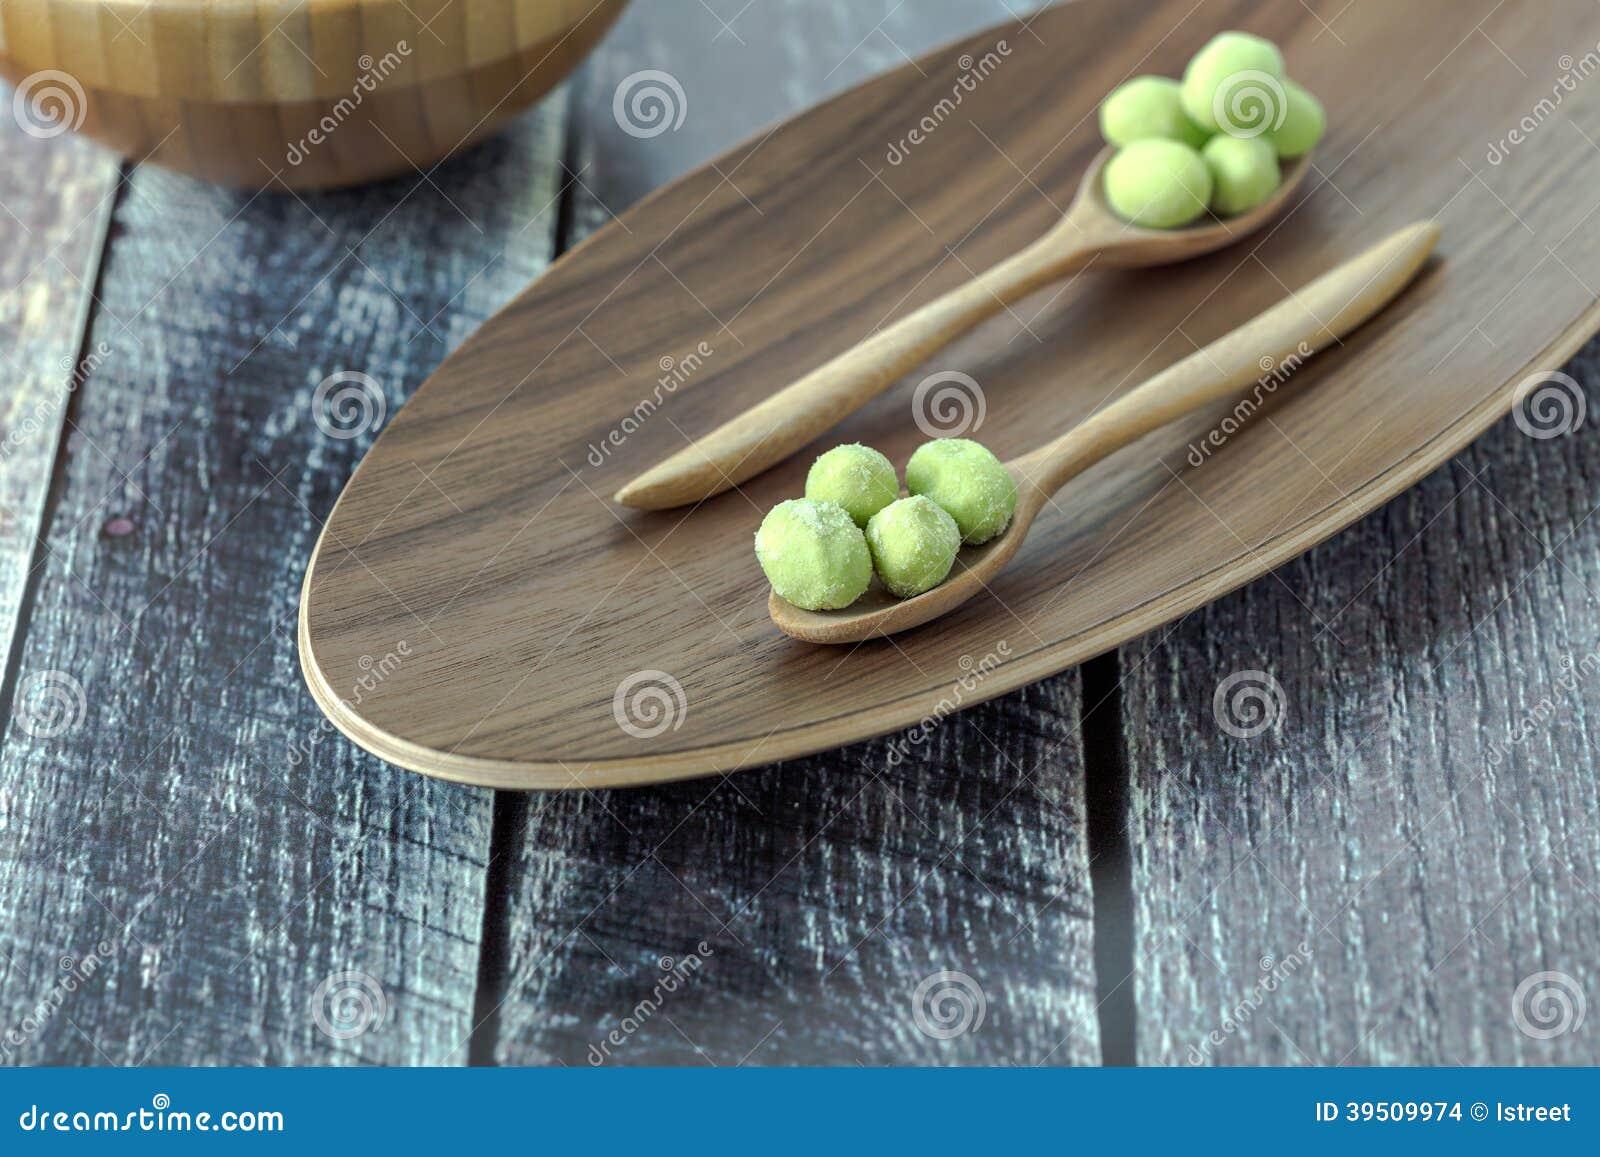 Wasabi coated pistachios